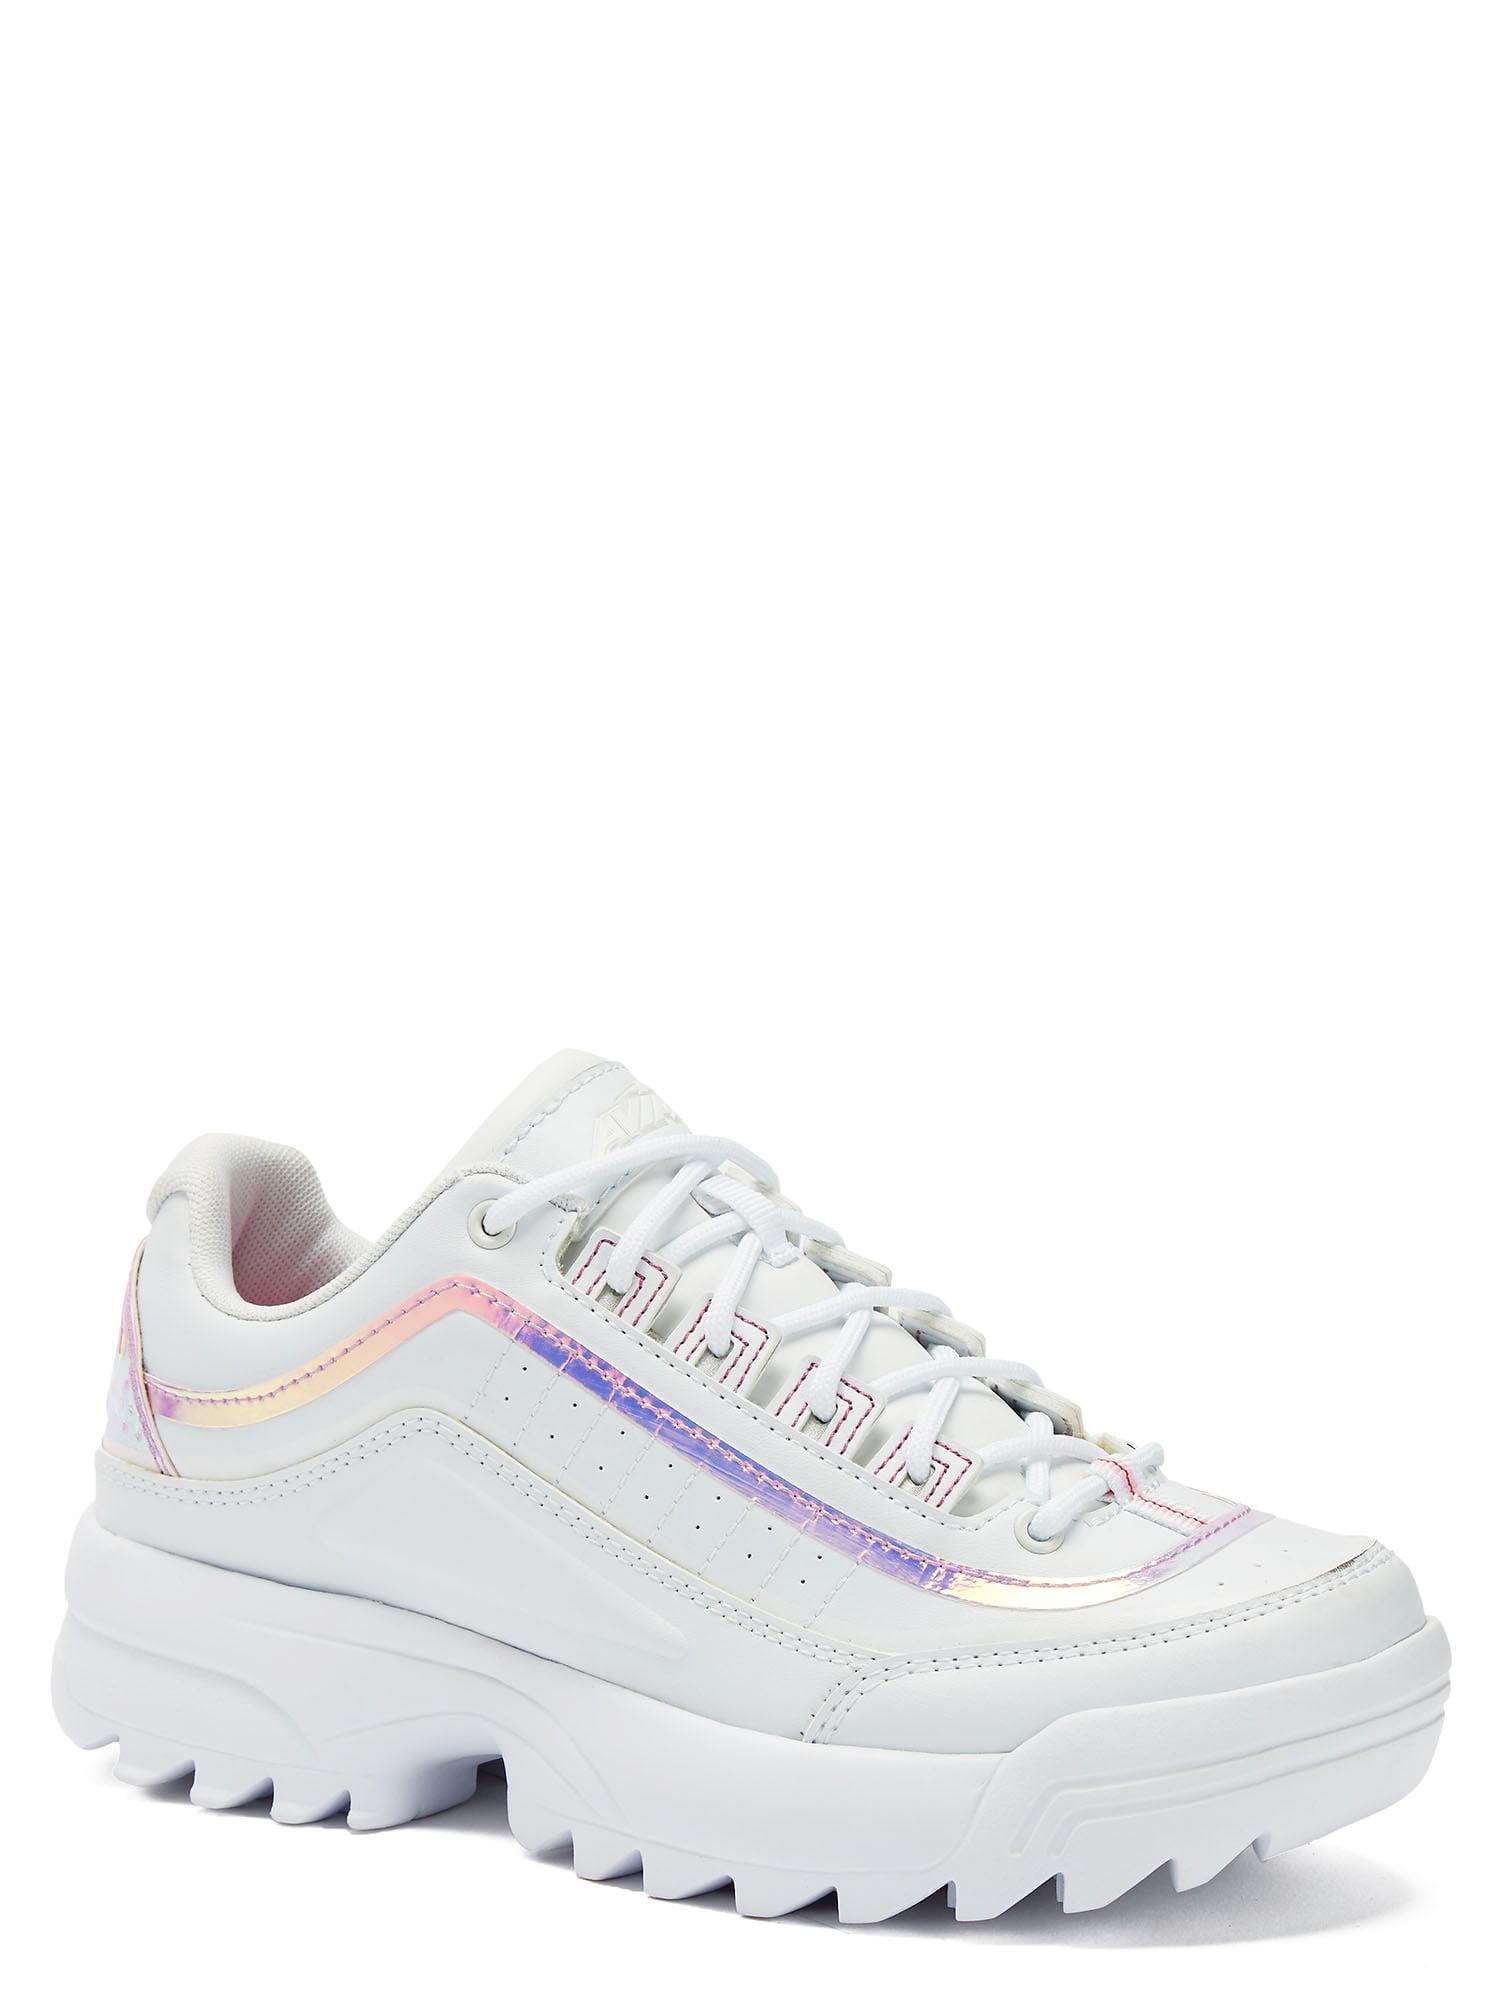 Avia - Women's Avia Athletics Sneaker